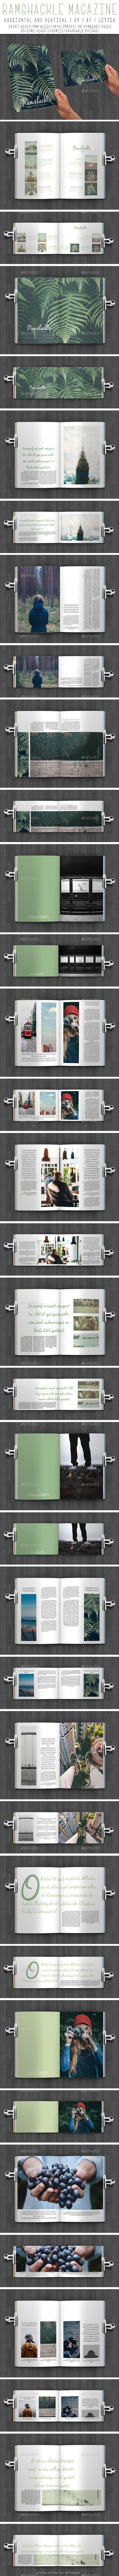 Ramshackle Magazine - Magazines Print Templates